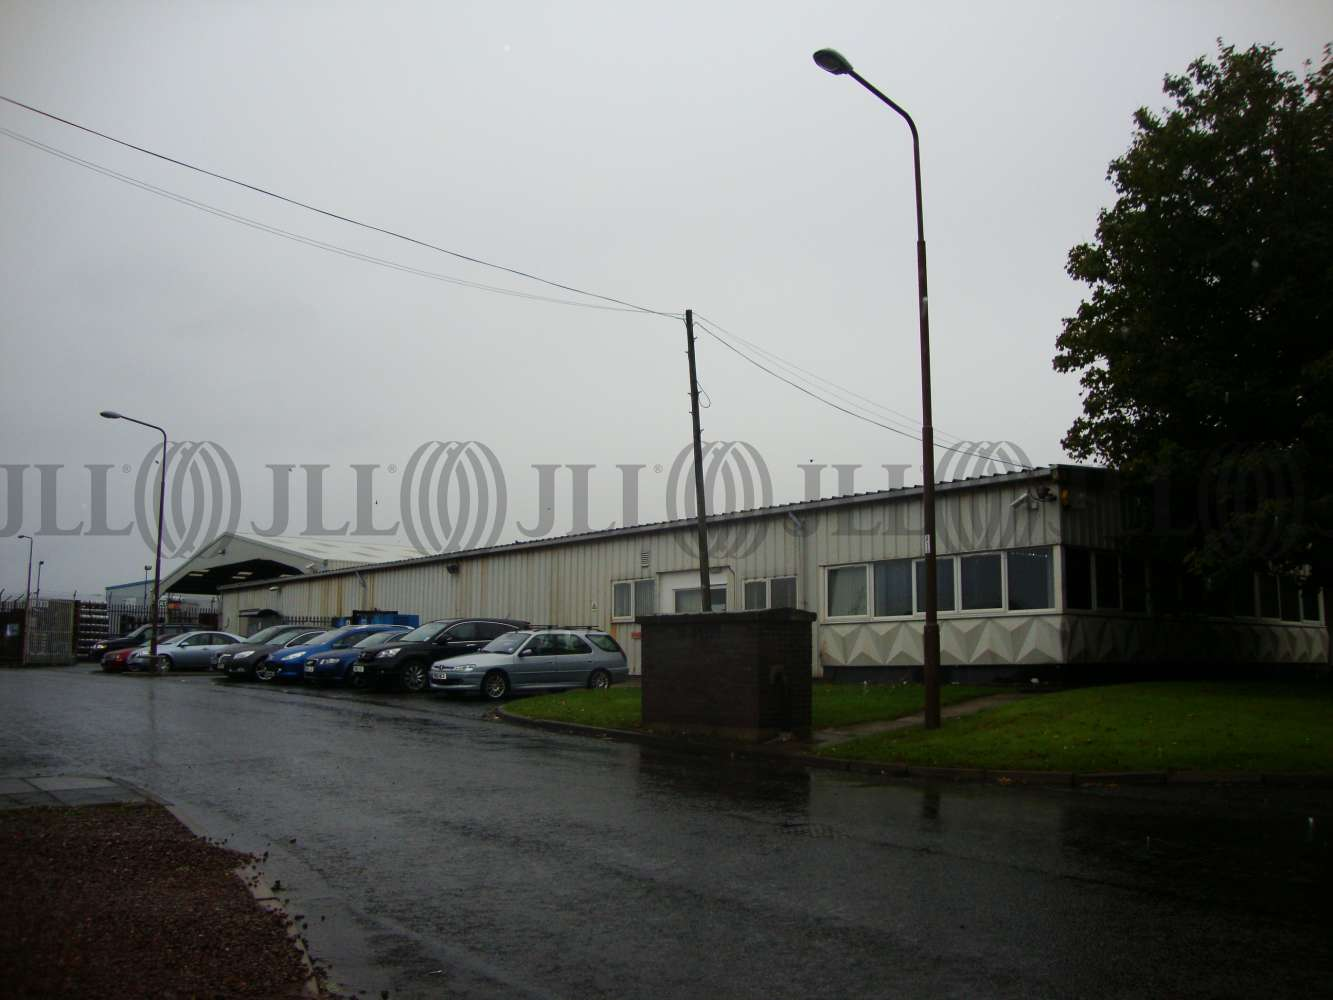 Industrial Dunbar, EH42 1RS - Belhaven Brewery Site - 08318